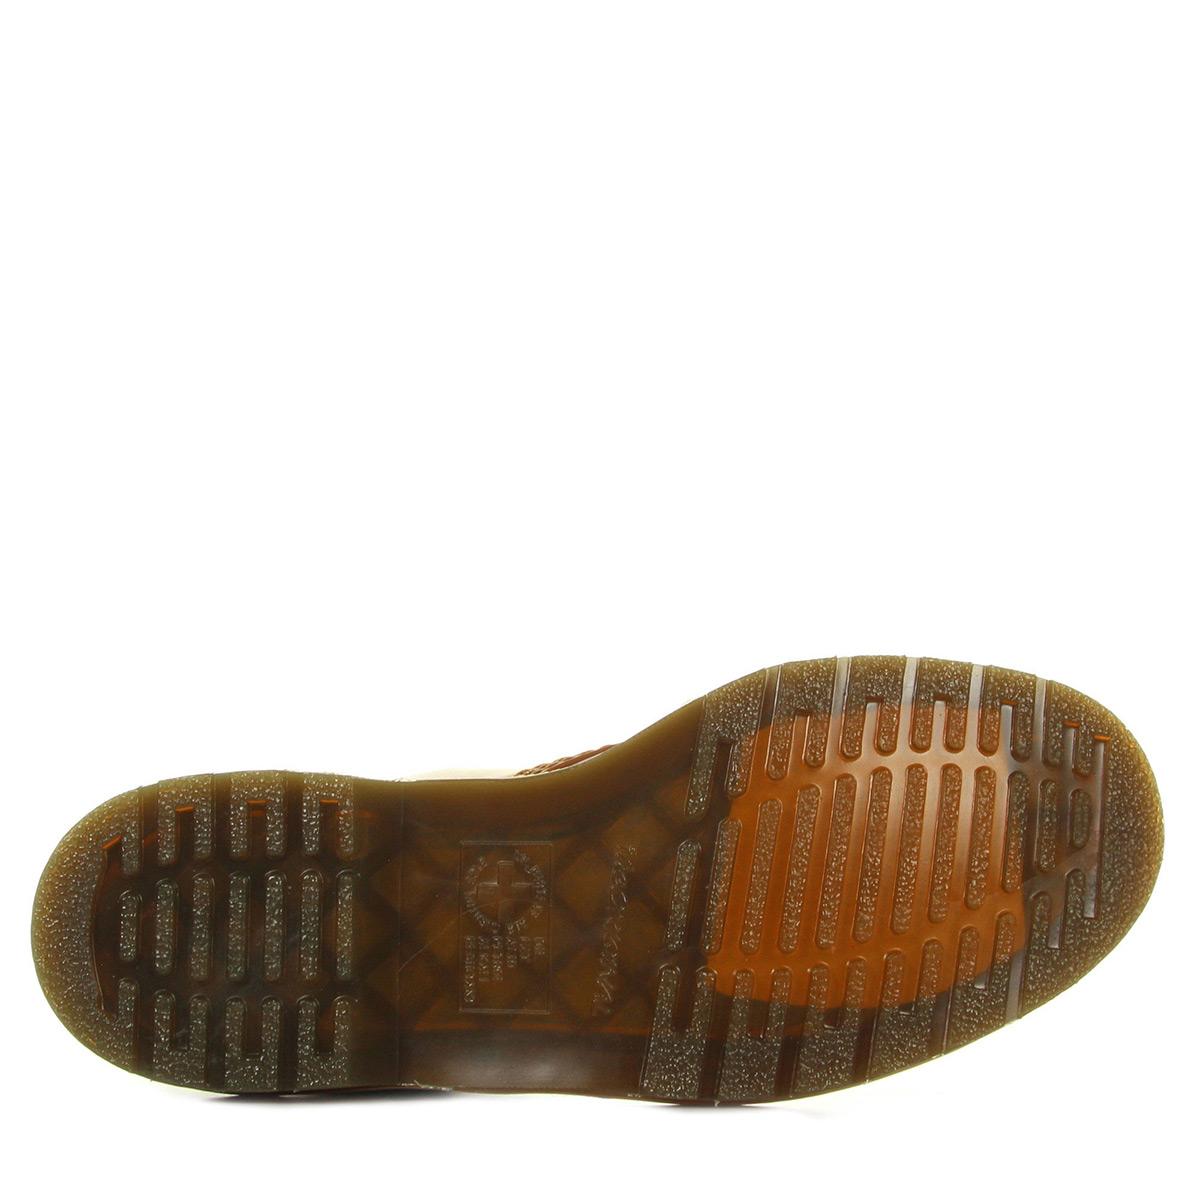 Dr. Martens 1460 Oak Analine 22912228, Boots